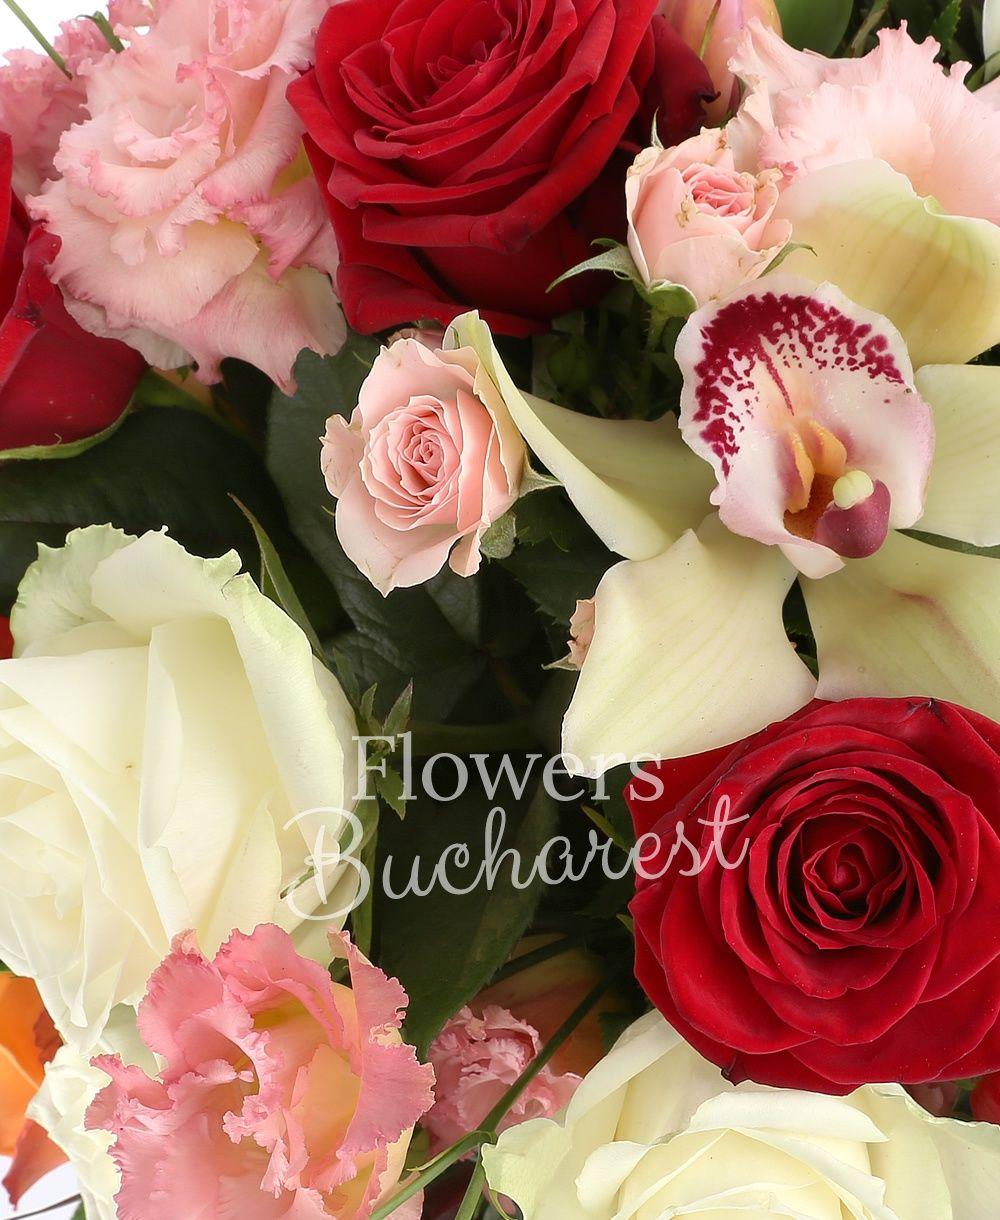 3 orange roses, 3 red roses, 3 white roses, green cymbidium, pink cymbidium, 5 pink tulips, 3 green hypericum, 3 leucadendron, 5 pink lisianthus, 3 pink miniroses, greenery